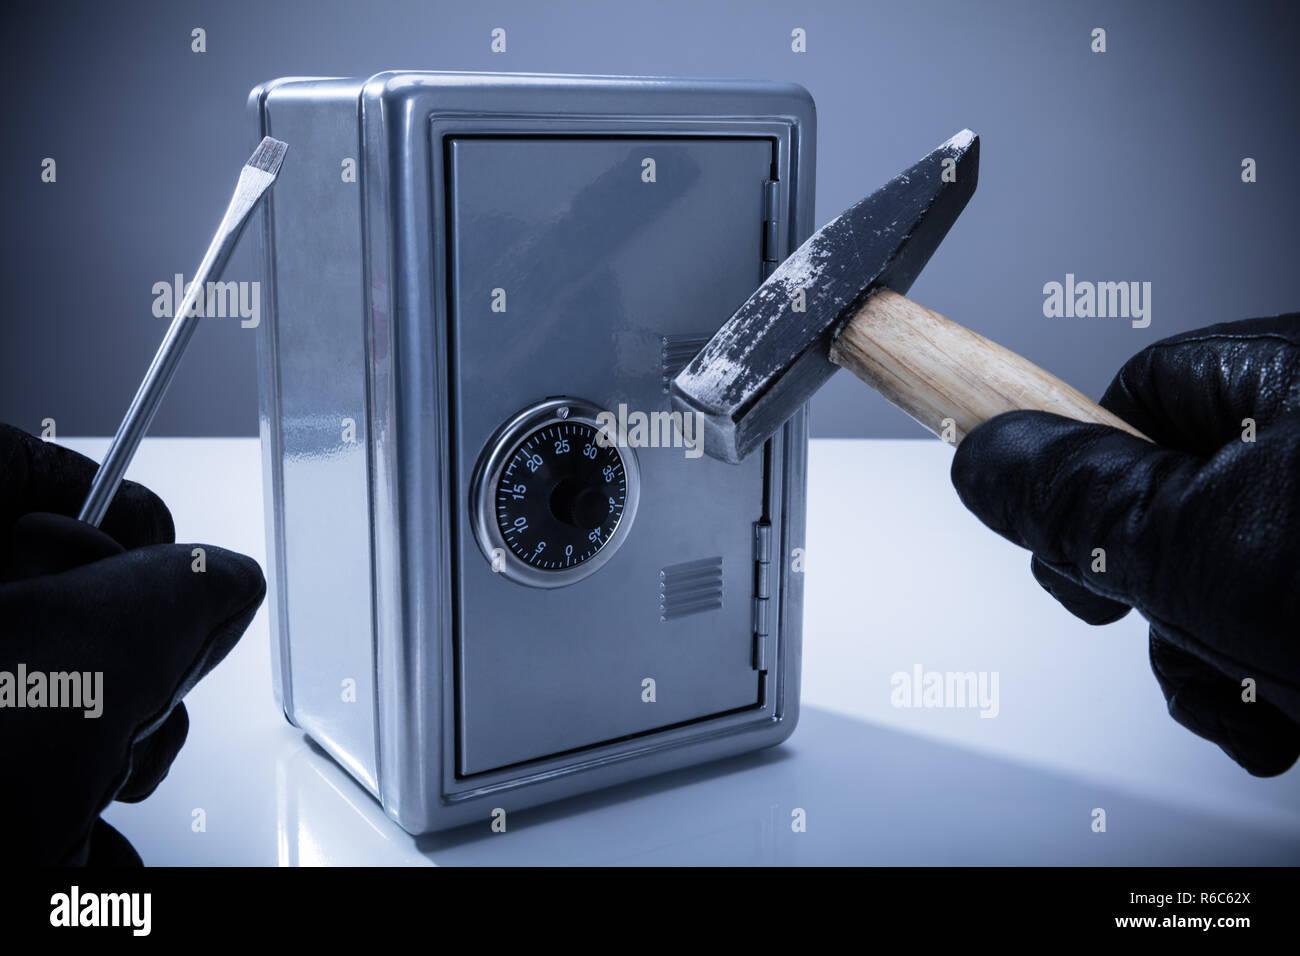 Burglar Cracking Safe Stock Photos & Burglar Cracking Safe